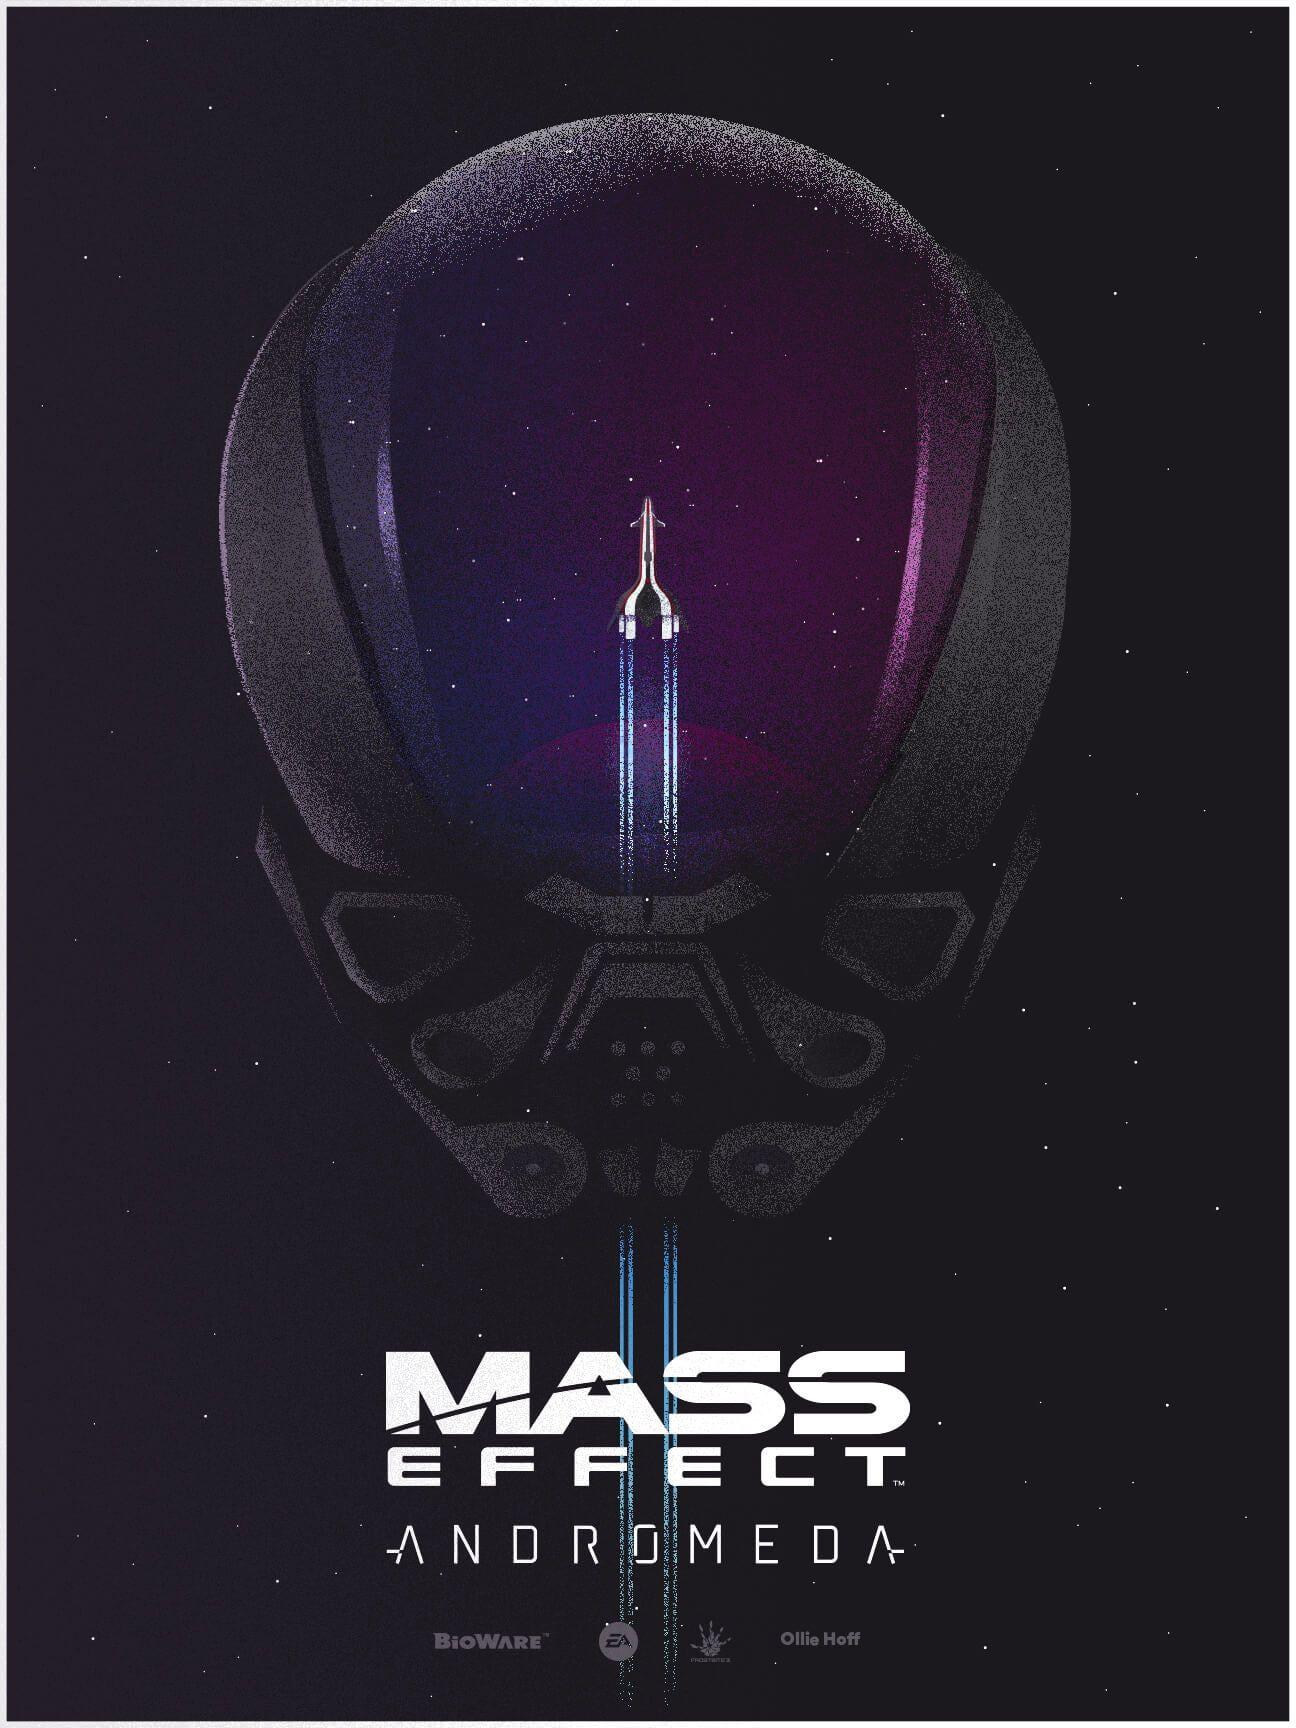 Mass Effect Andromeda Bioware Tempest Ea Games Video Games 720p Wallpaper Hdwallpaper Desktop In 2020 Mass Effect Hd Wallpaper Hd Wallpapers For Mobile